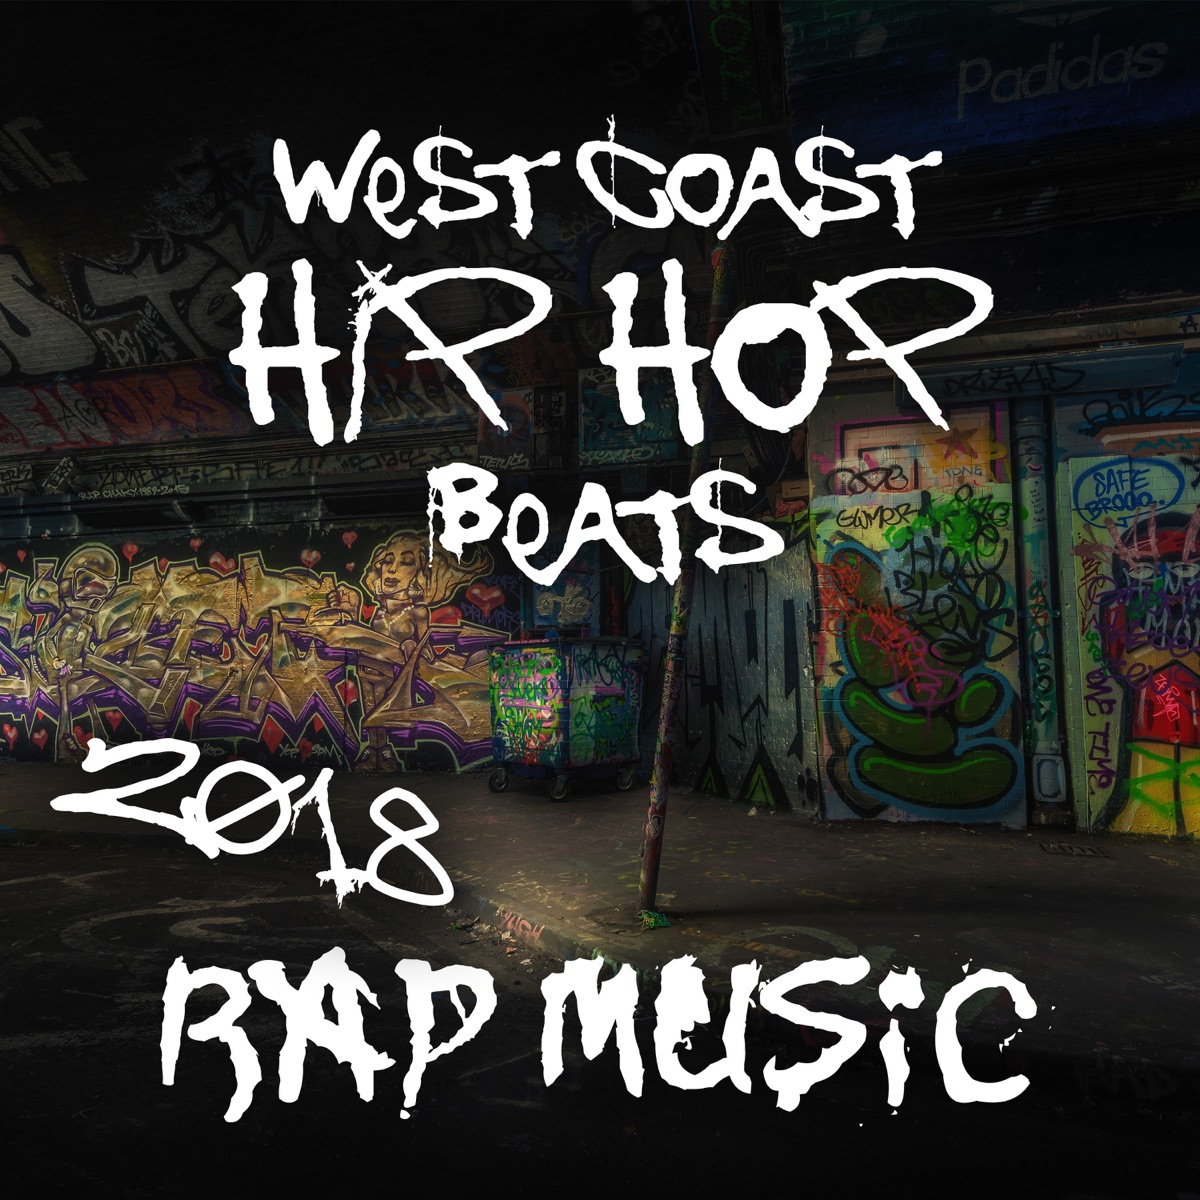 West Coast Hip Hop Beats: 2018 Rap Music, Freestyle Beats, Dirty